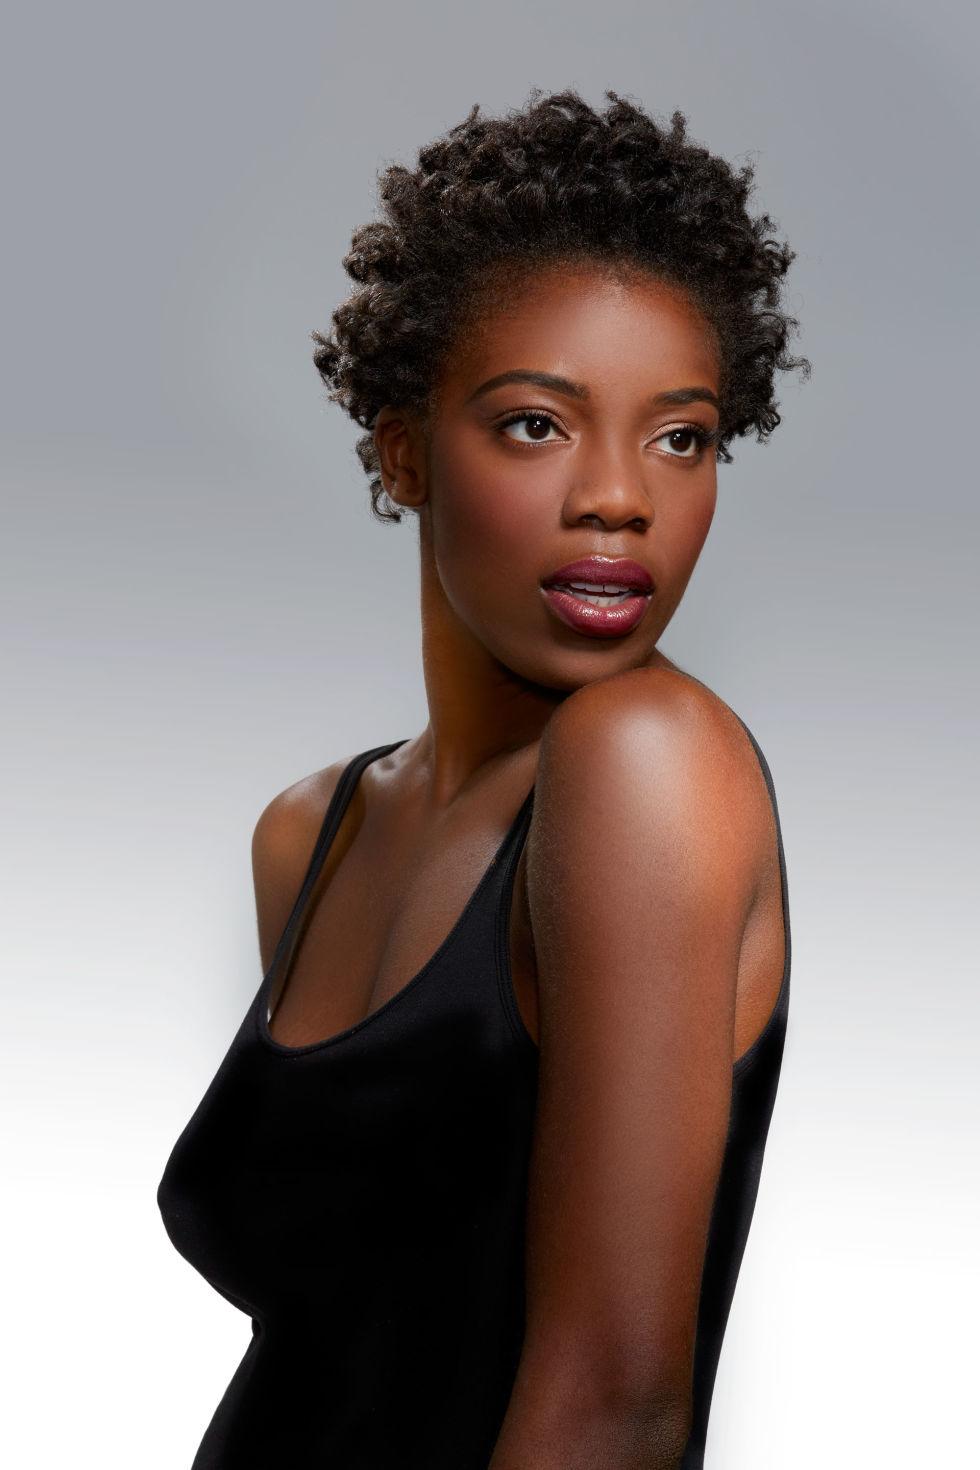 Incredible 29 Black Hairstyles Best African American Hairstyles Amp Haircuts Short Hairstyles Gunalazisus